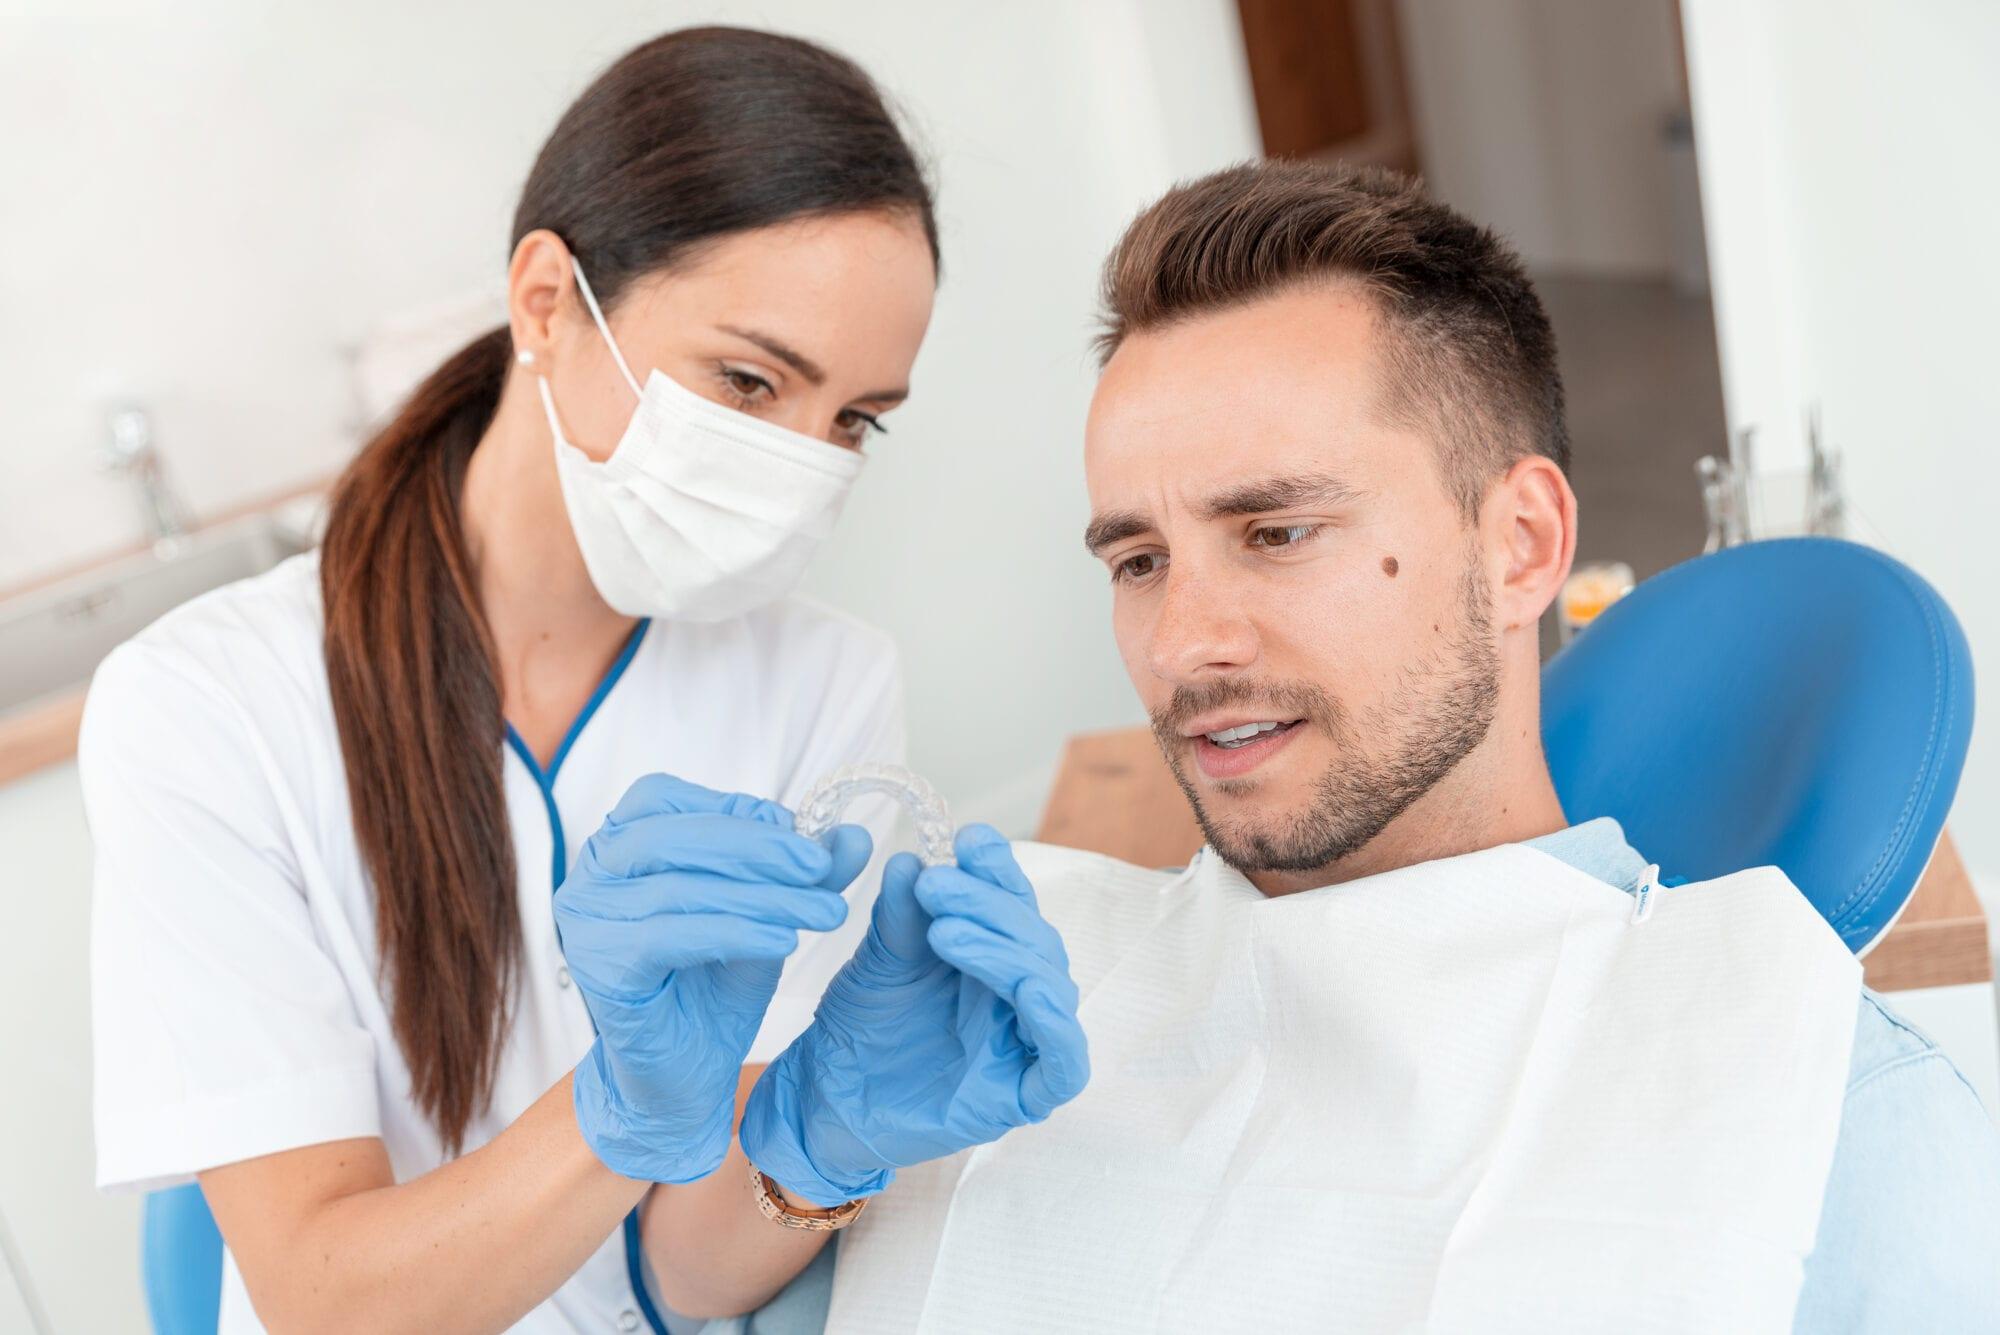 Dentist shows invisible braces aligner